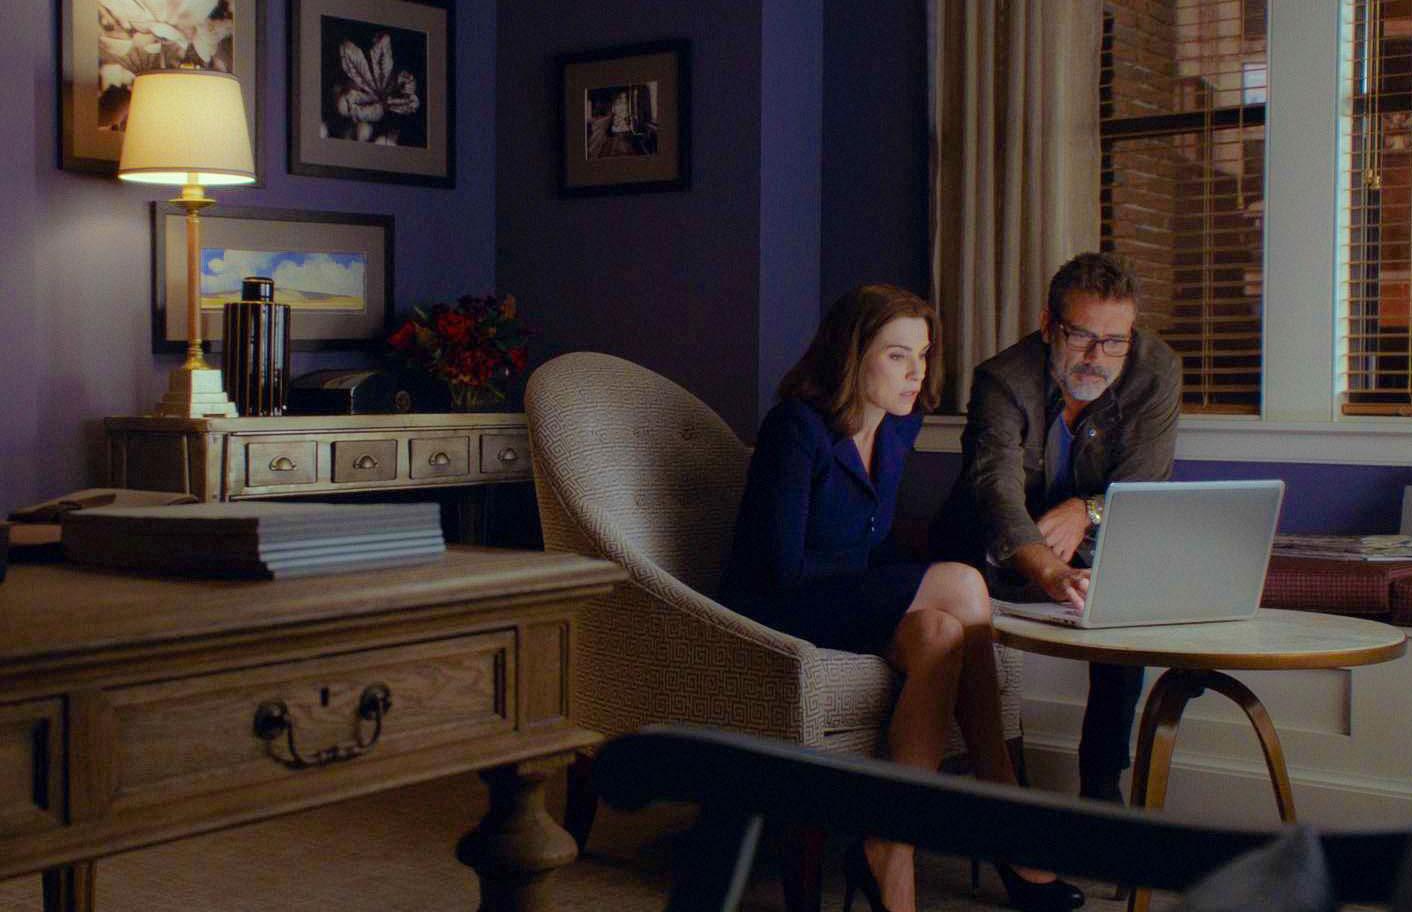 Julianna Margulies as Alicia Florrick and Jeffrey Dean Morgan as Jason Crouse